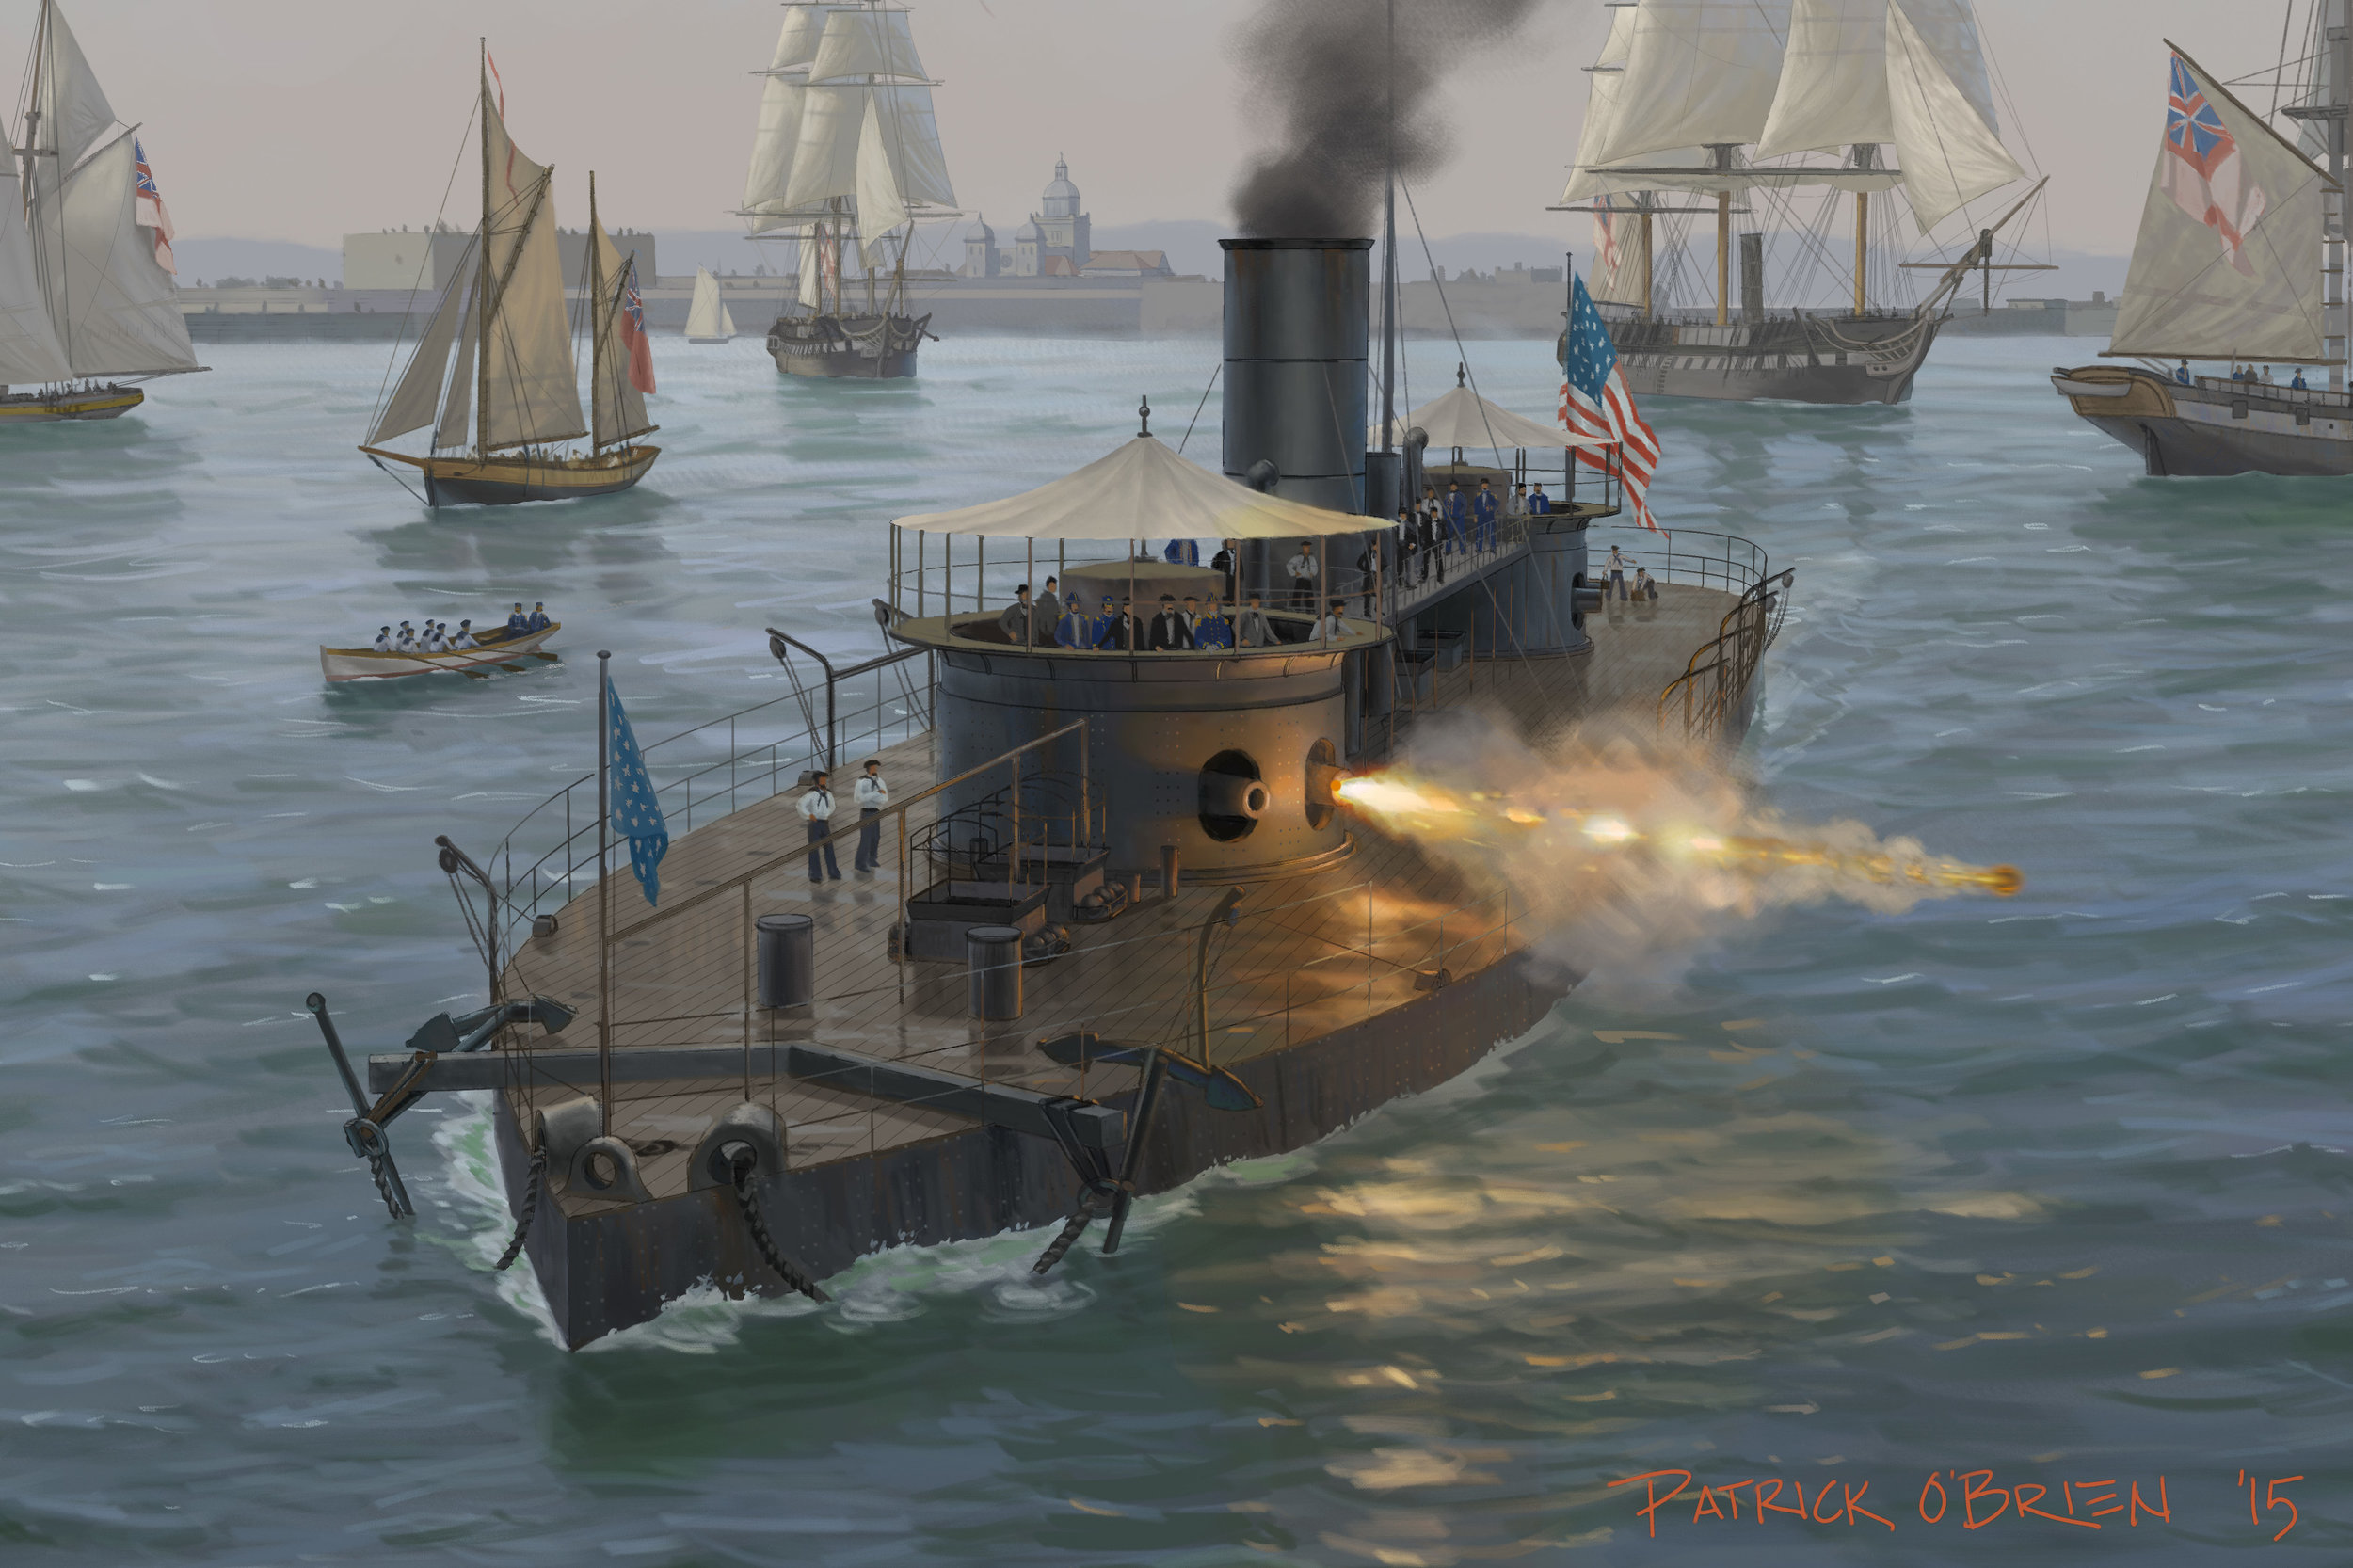 illustration of the ironclad USS  Miantonomoh